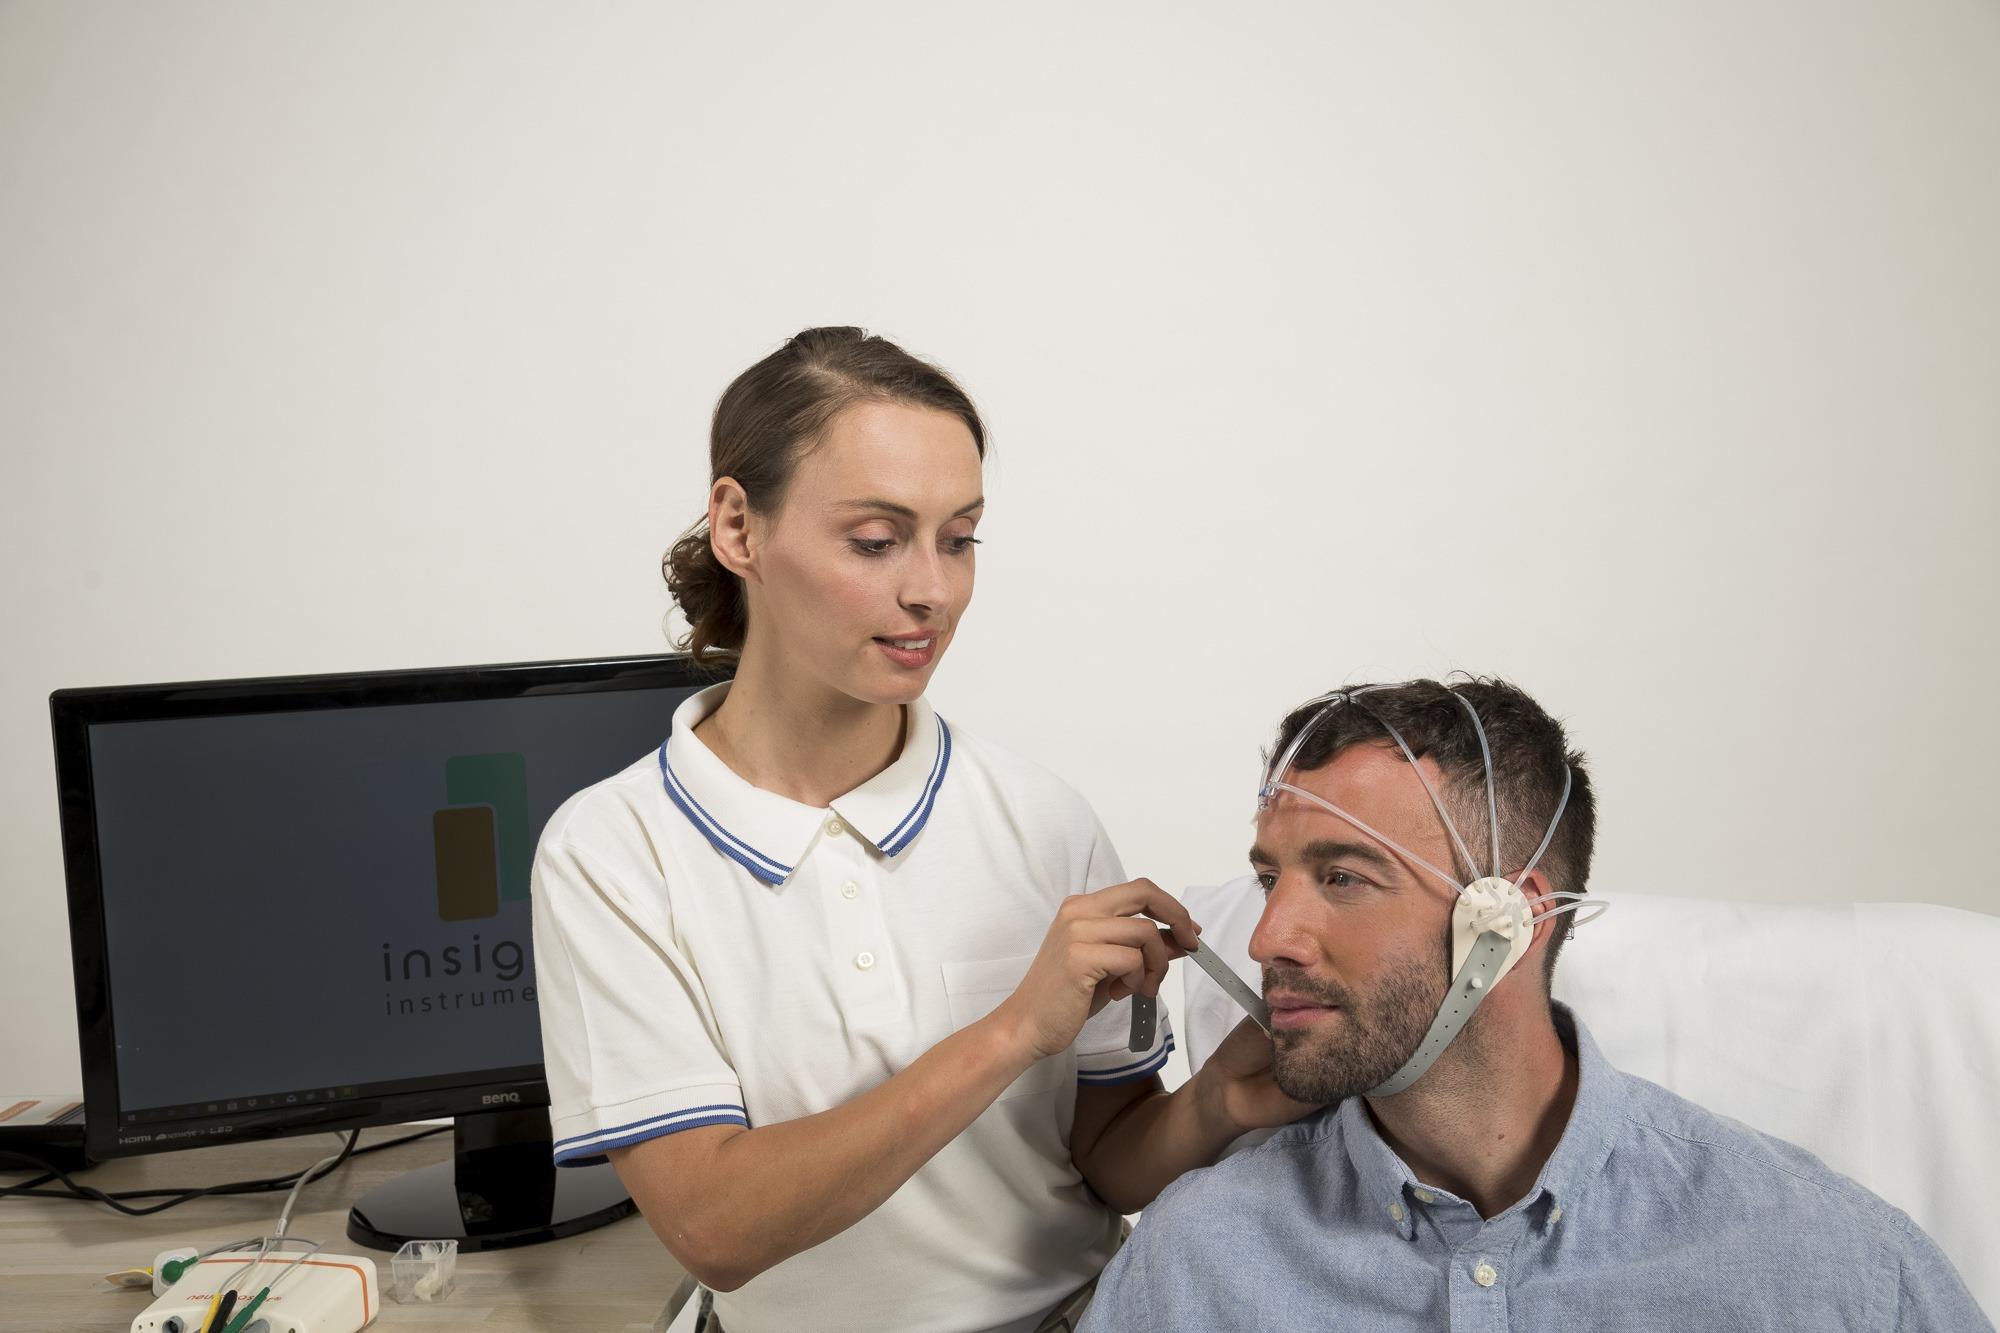 Therapeutin legt EEG-Headset an